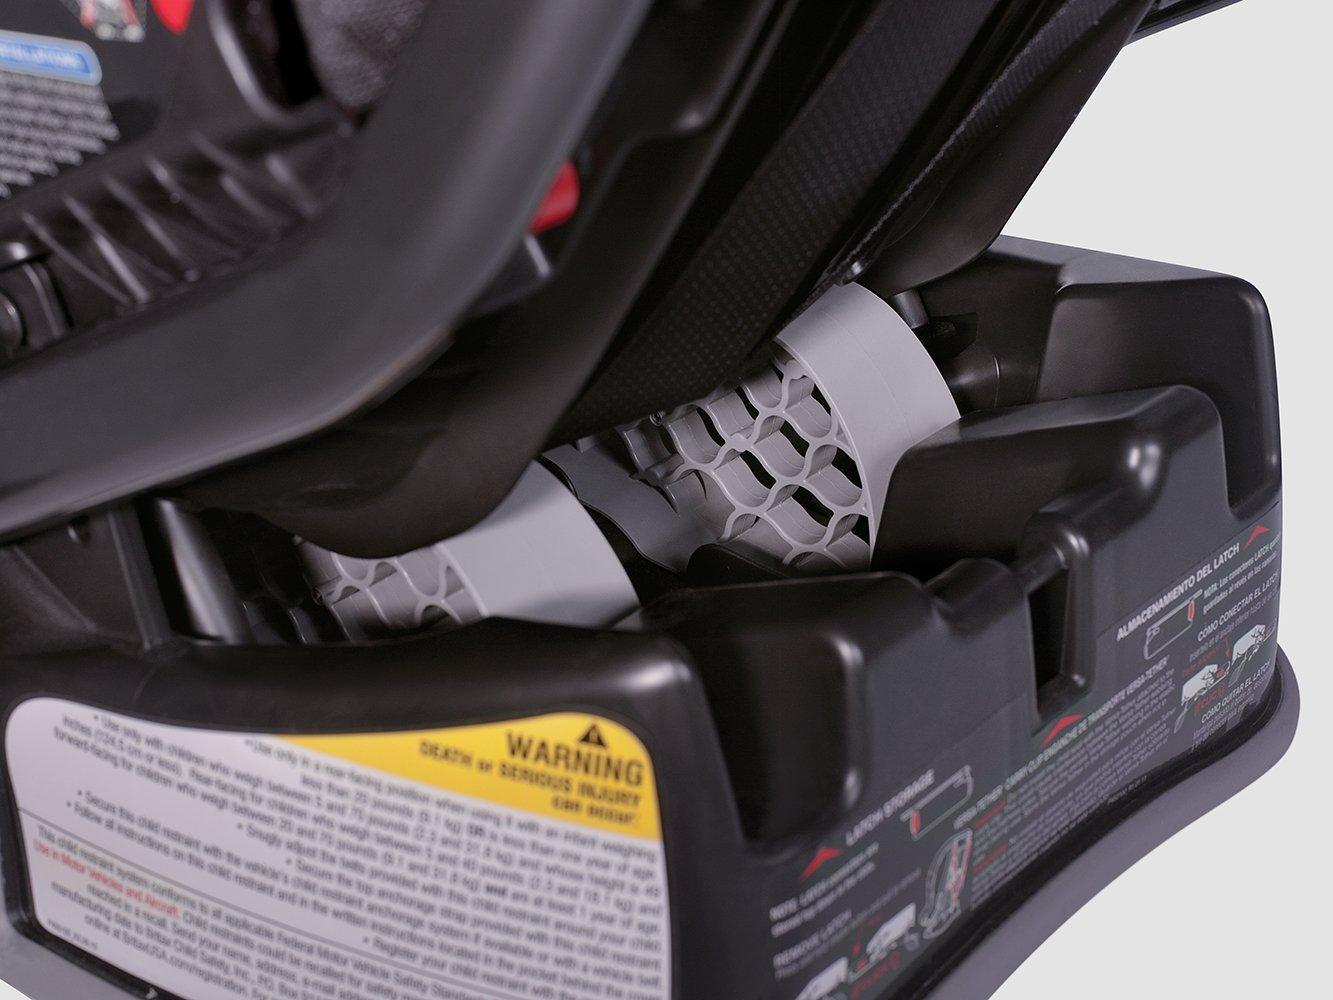 Amazon.com : Britax Pavilion G4 Convertible Car Seat, Cub Pink ...